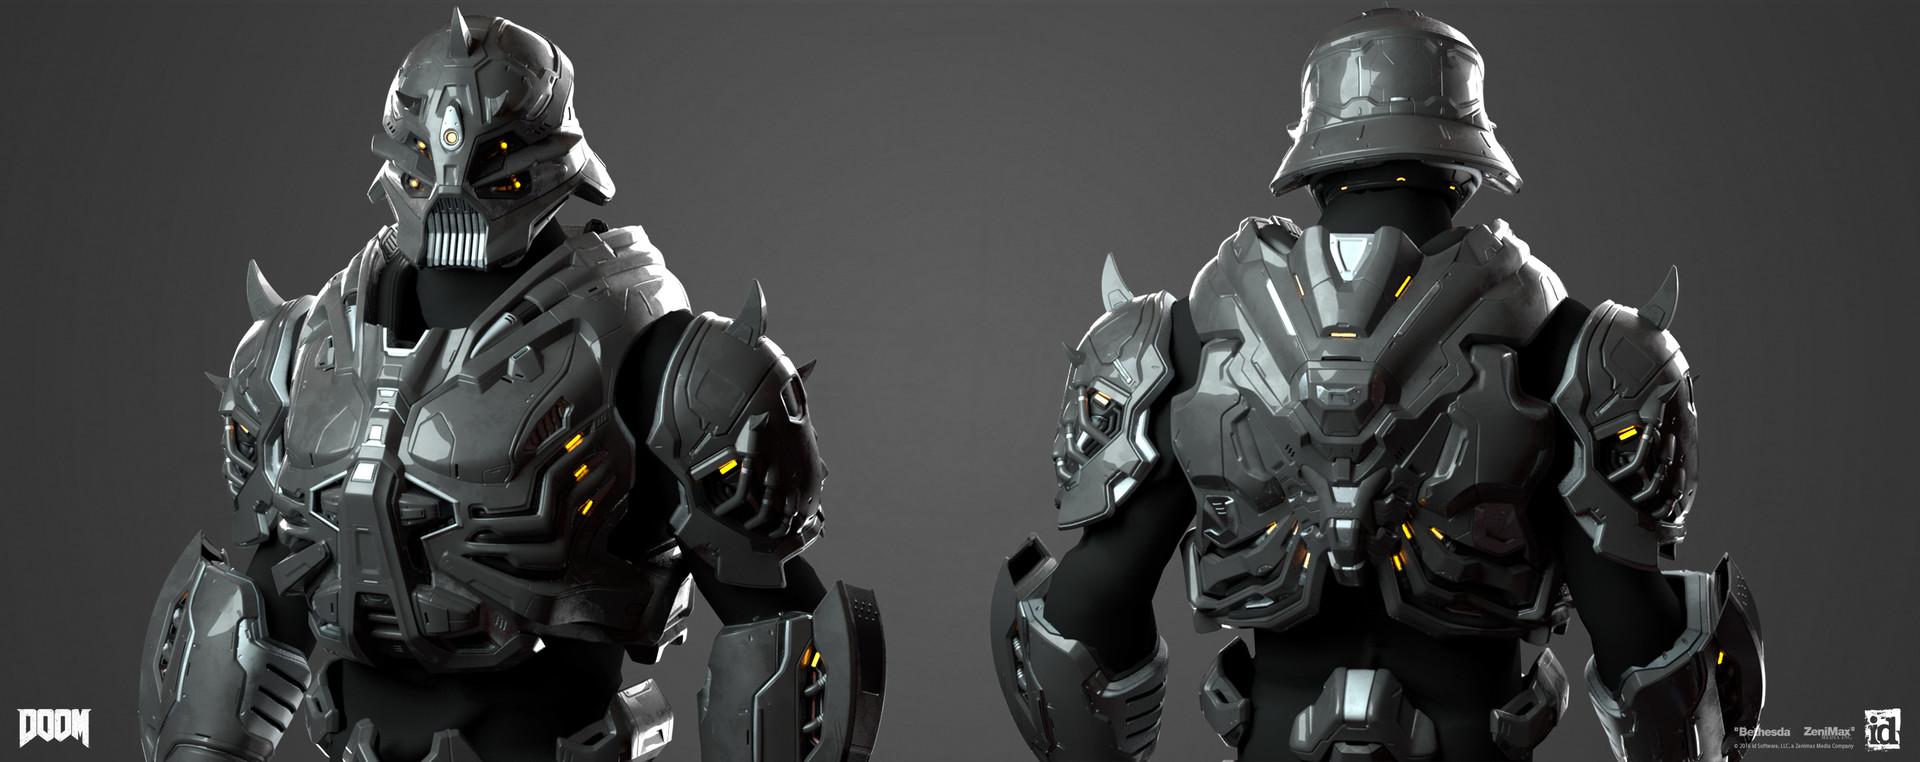 Emanuel Palalic Doom Robotic Armor